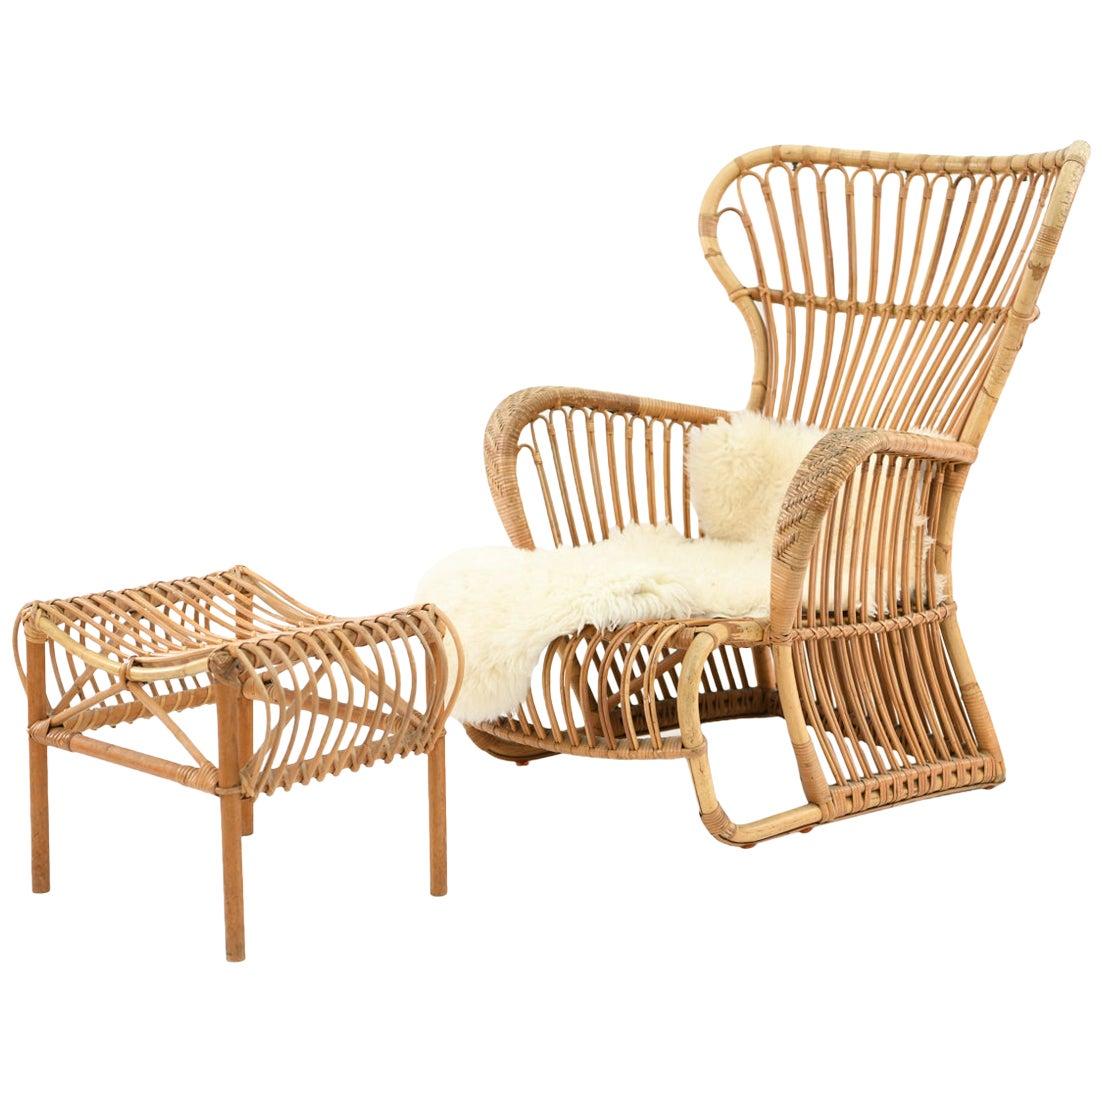 Danish Midcentury Wengler Lounge Chair and Ottoman